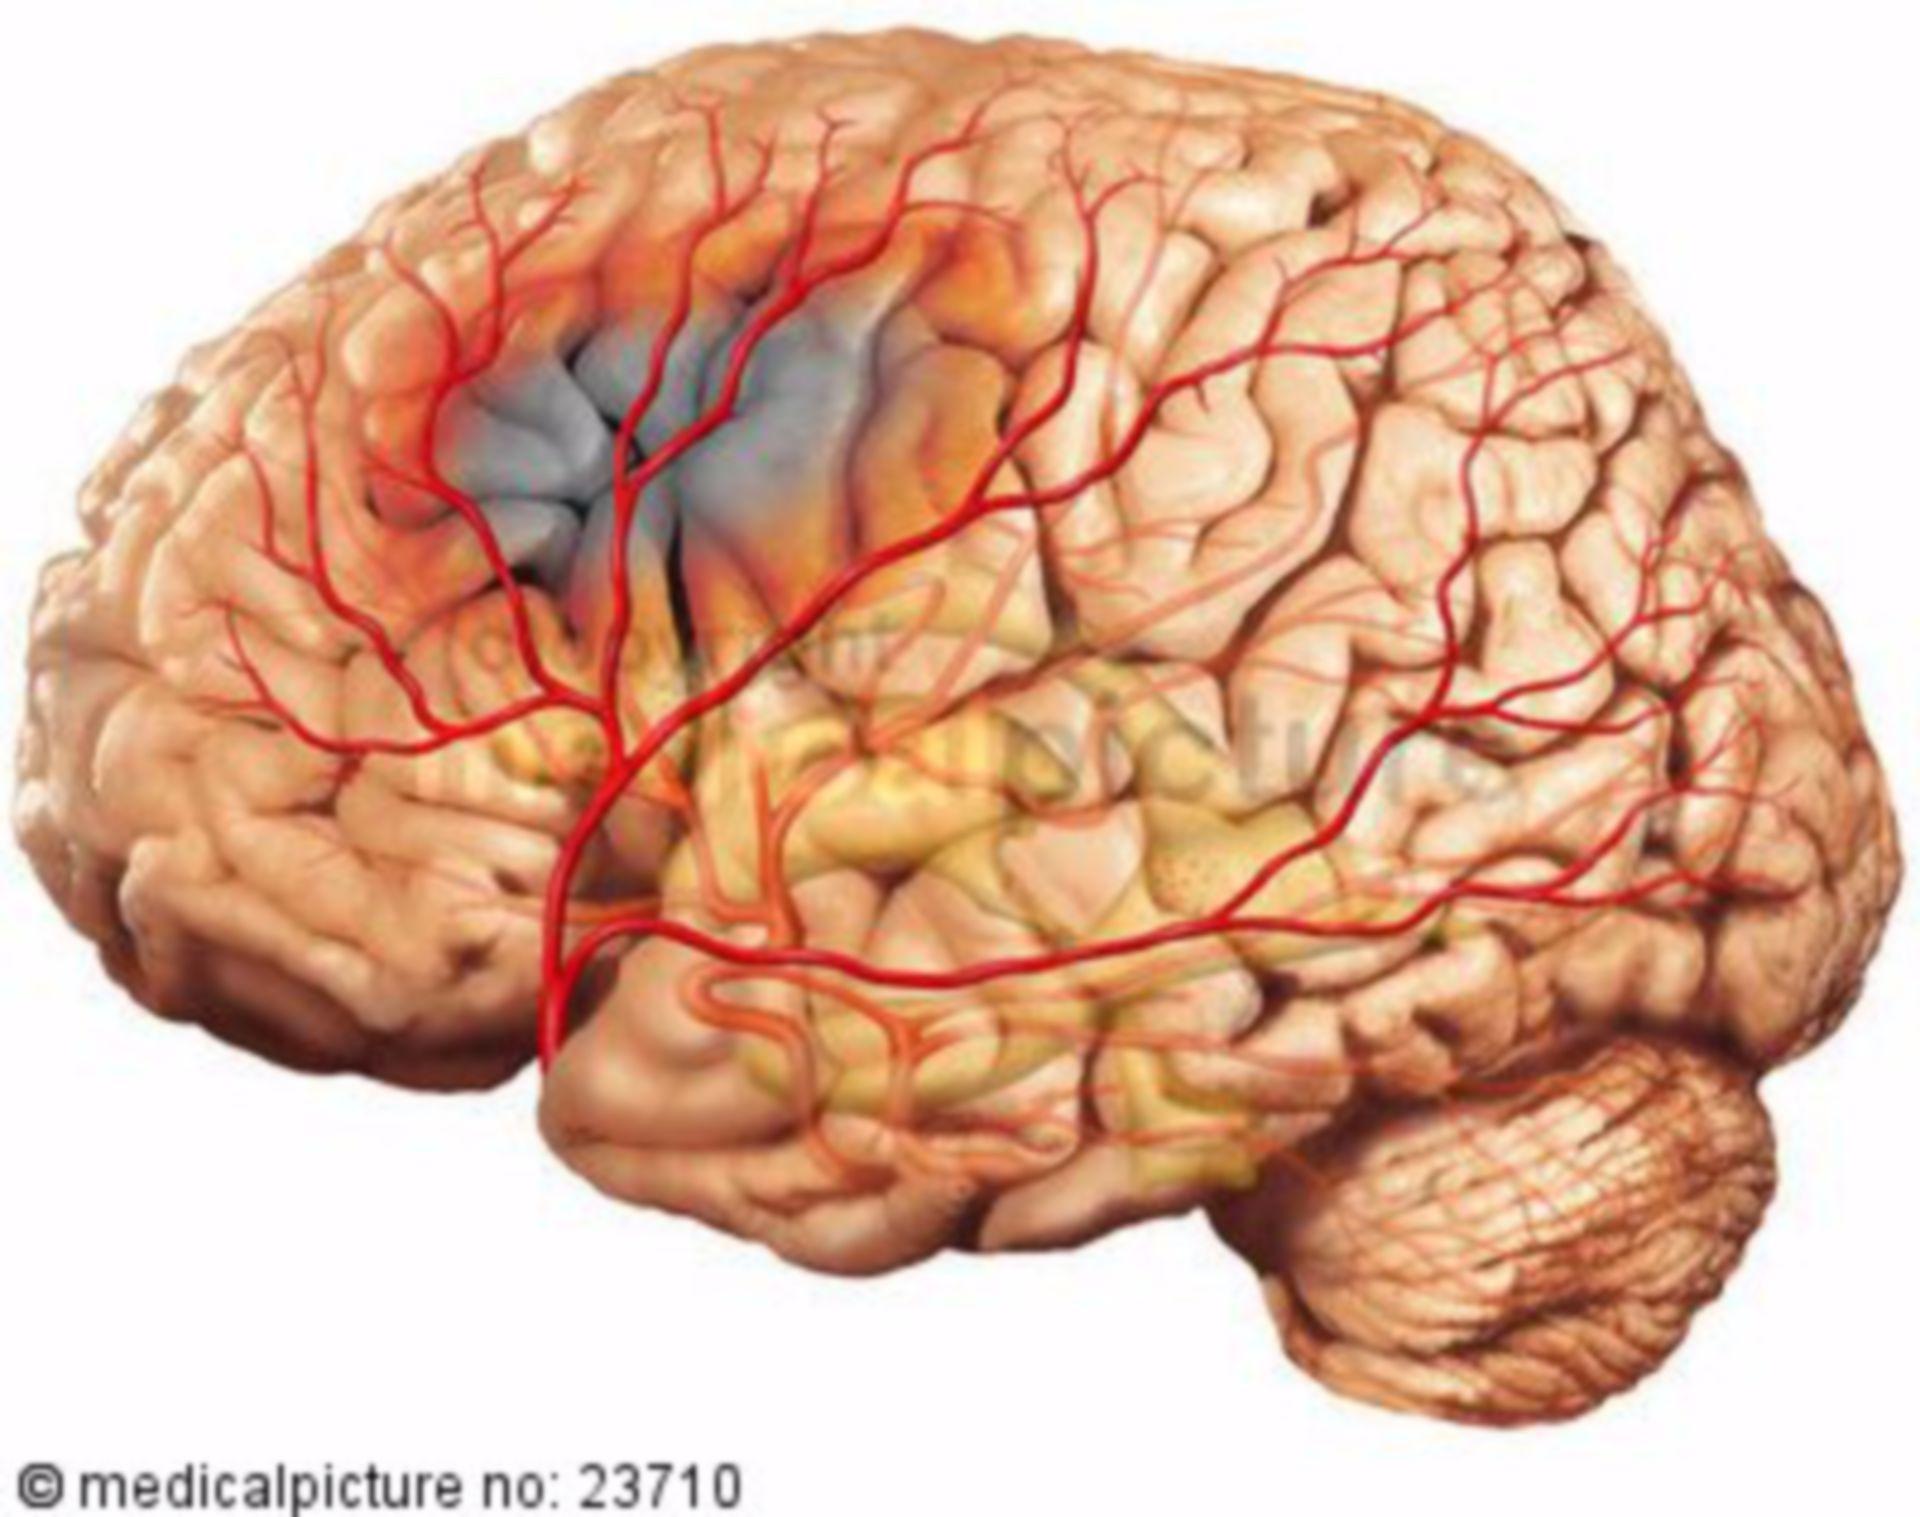 Depolerisation waves in ischemic stroke/ infaction